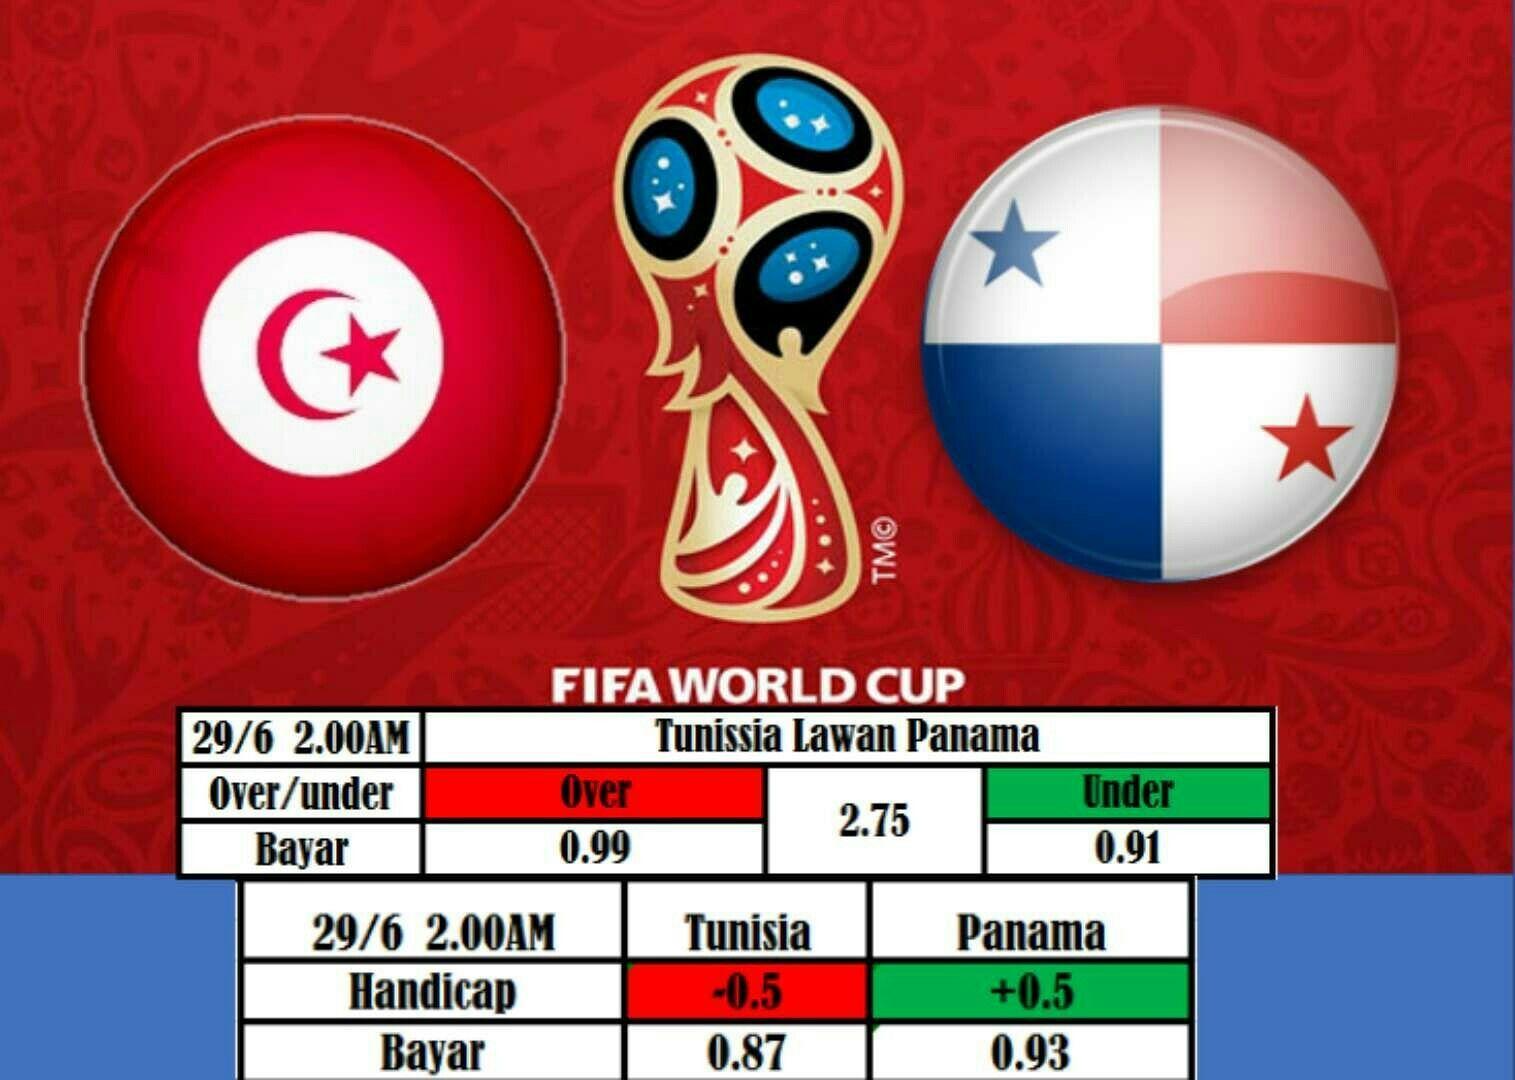 ⚽️ FIFA World Cup 2018 ⚽️ 4 tahun 1 kali sahaja. ️ Cepat